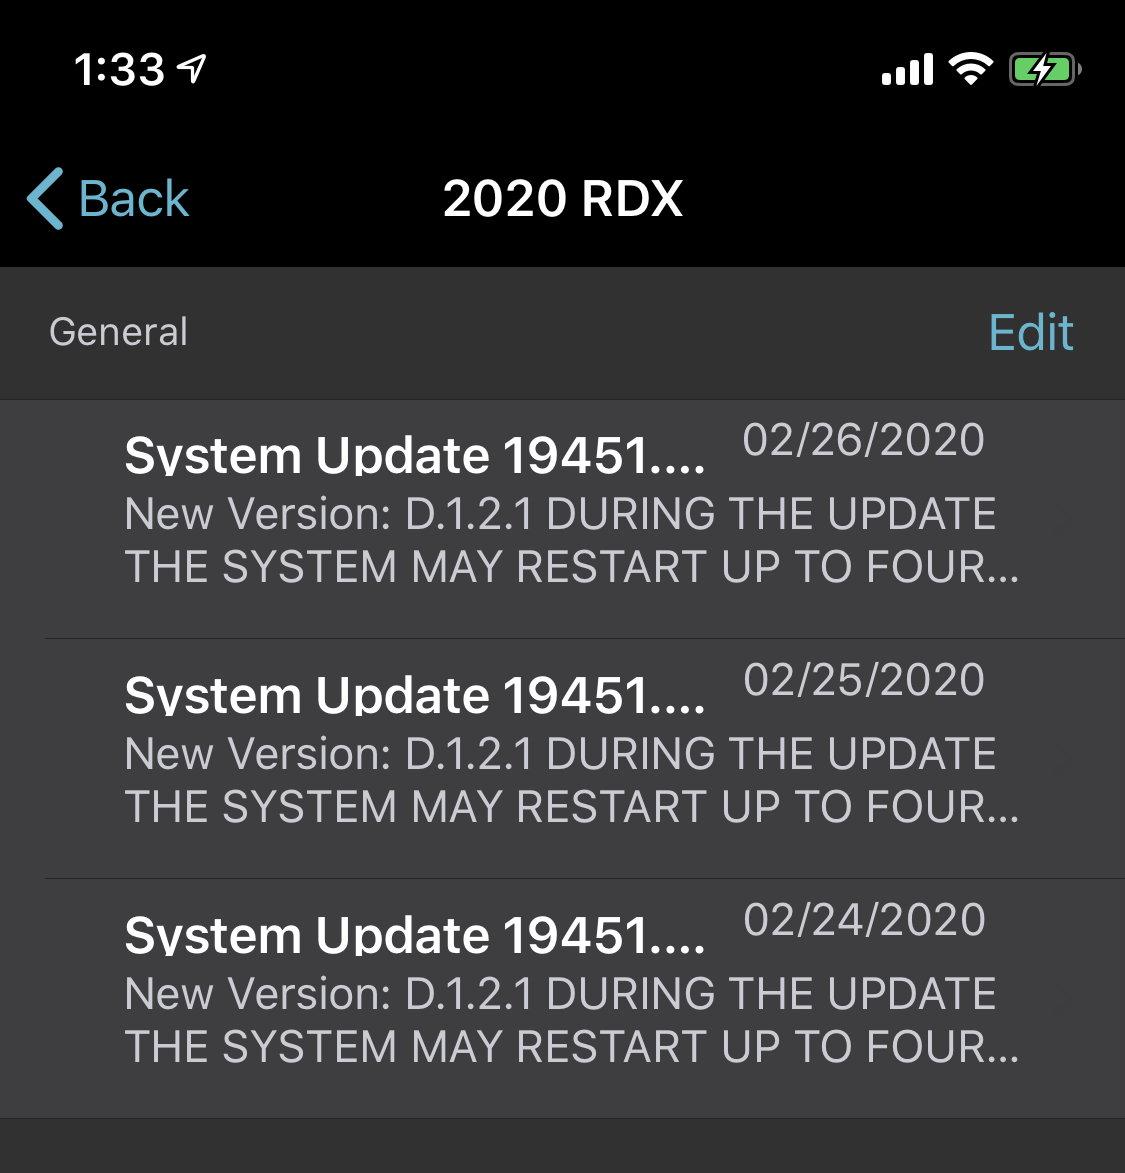 Software Update Released?